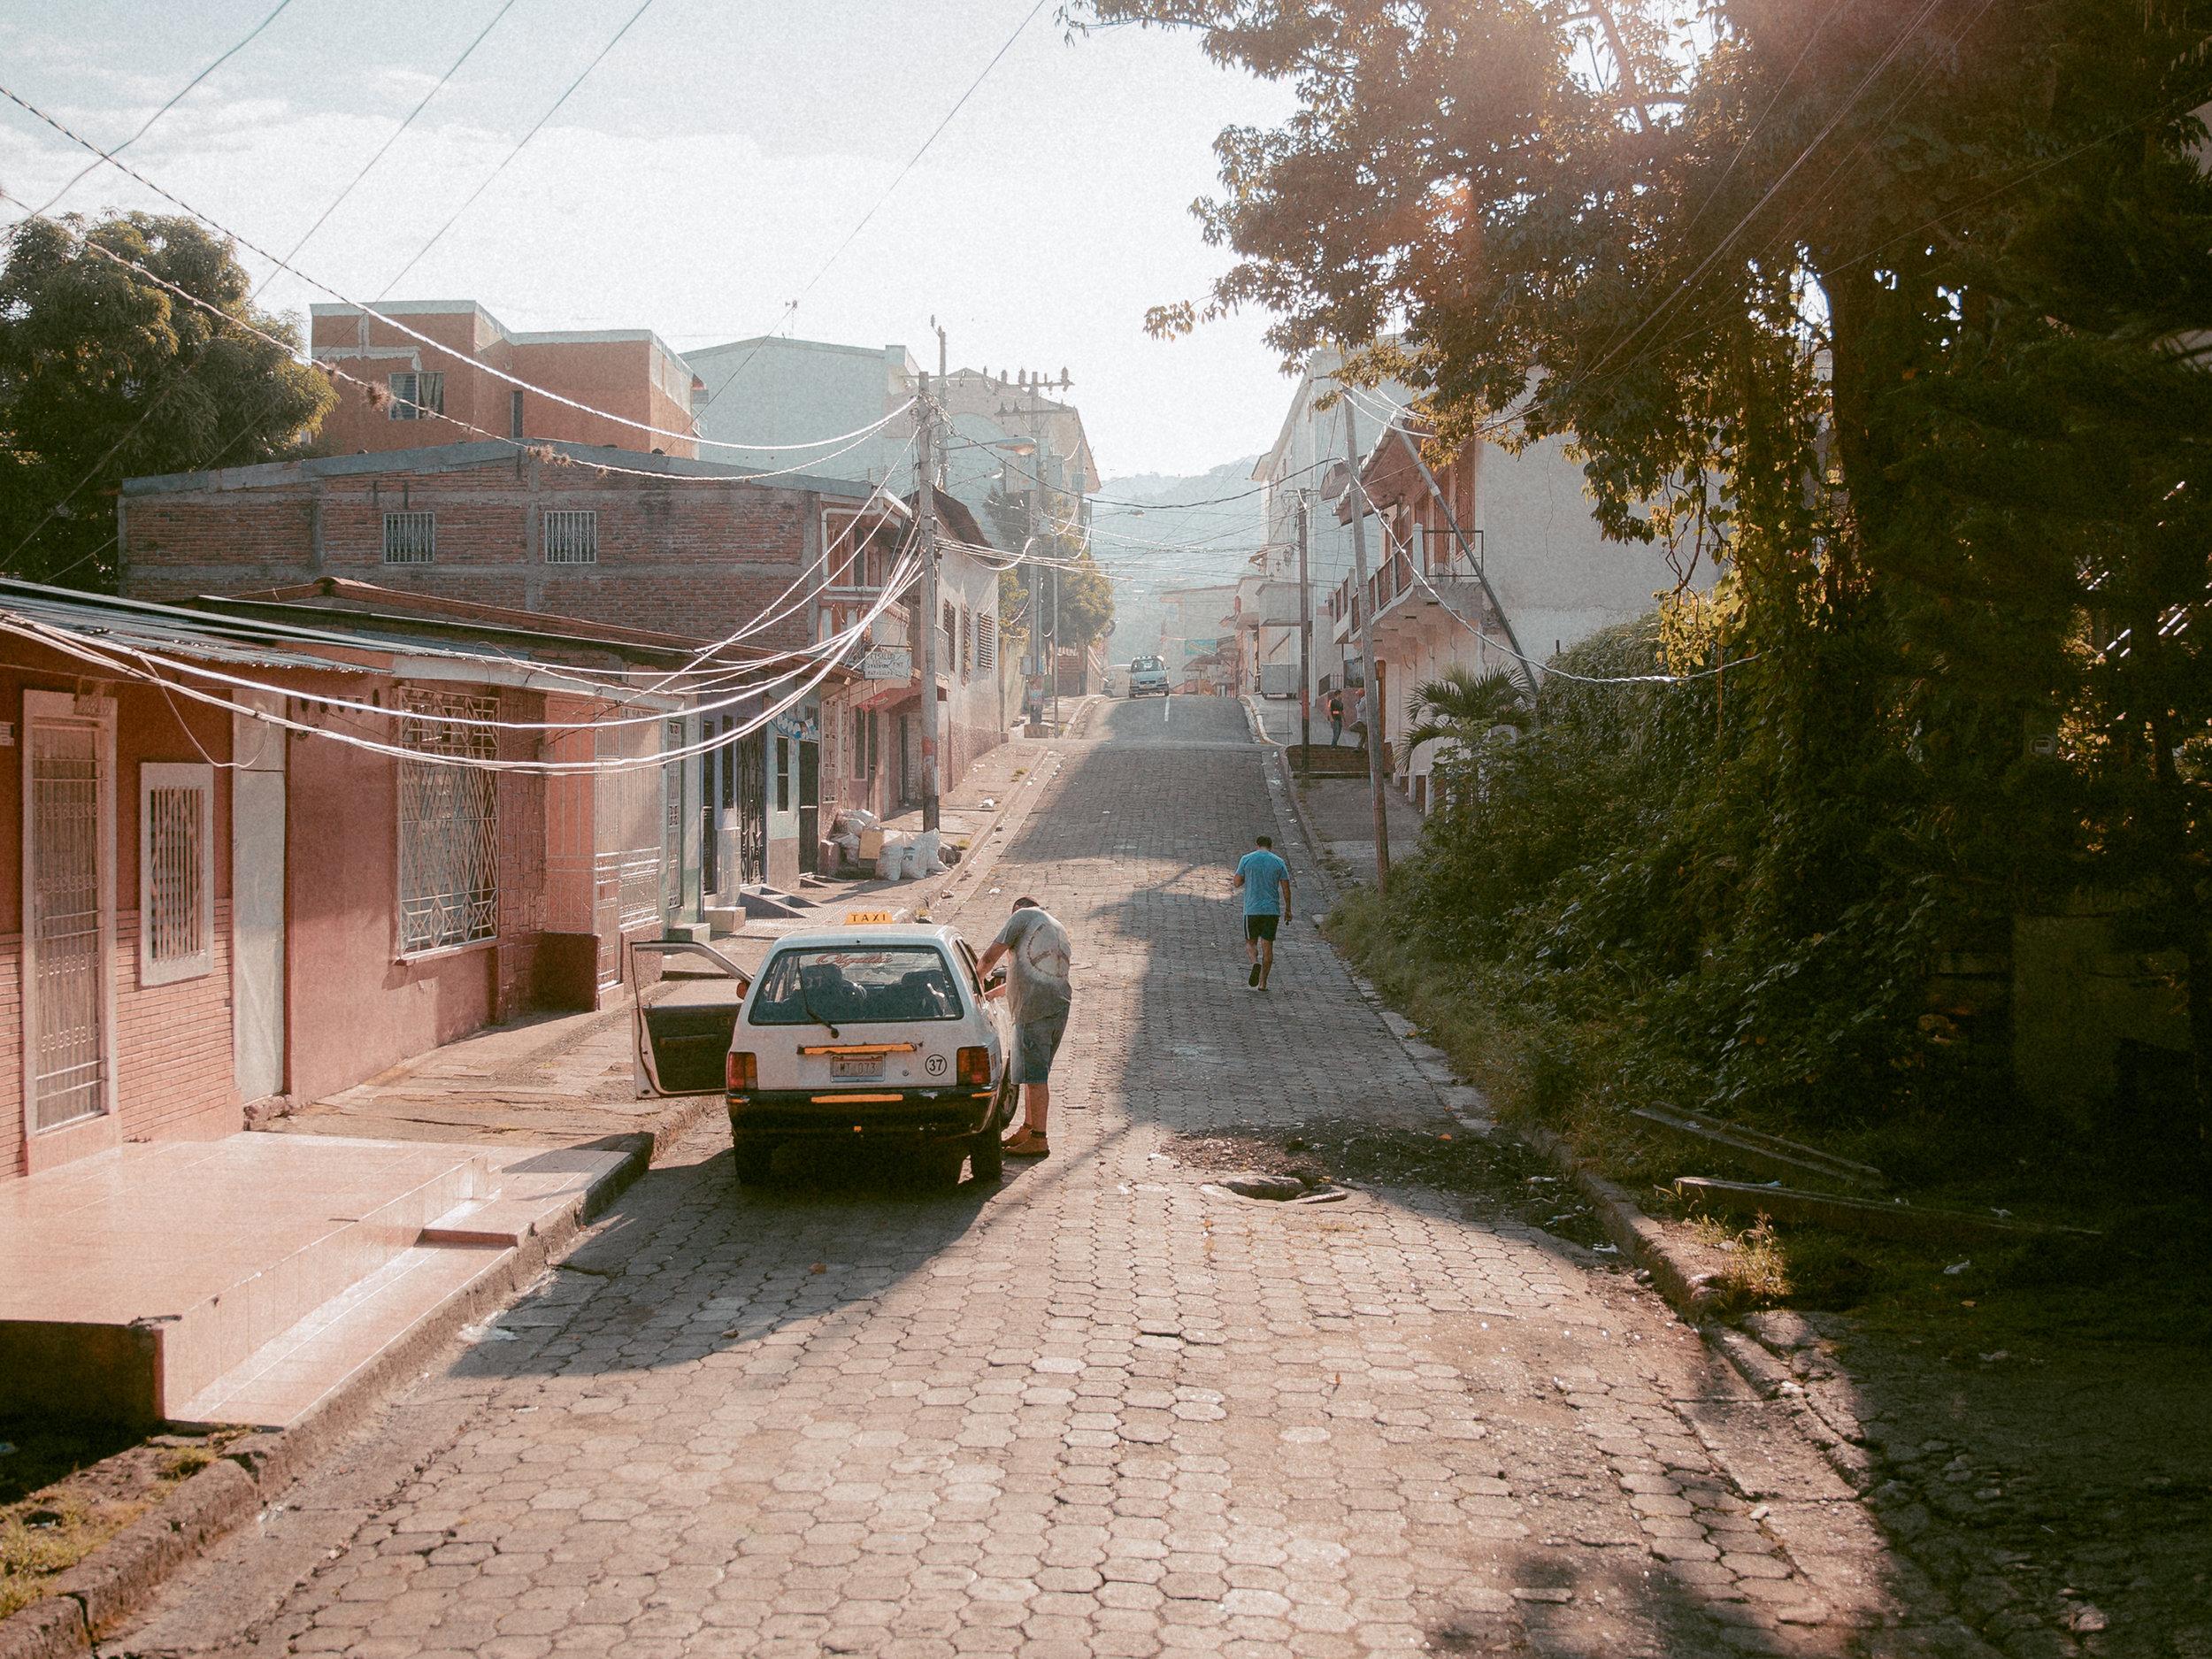 jonathanburkhart,oklahoma,streetphotography,matagalpa,nicaragua_28.jpg